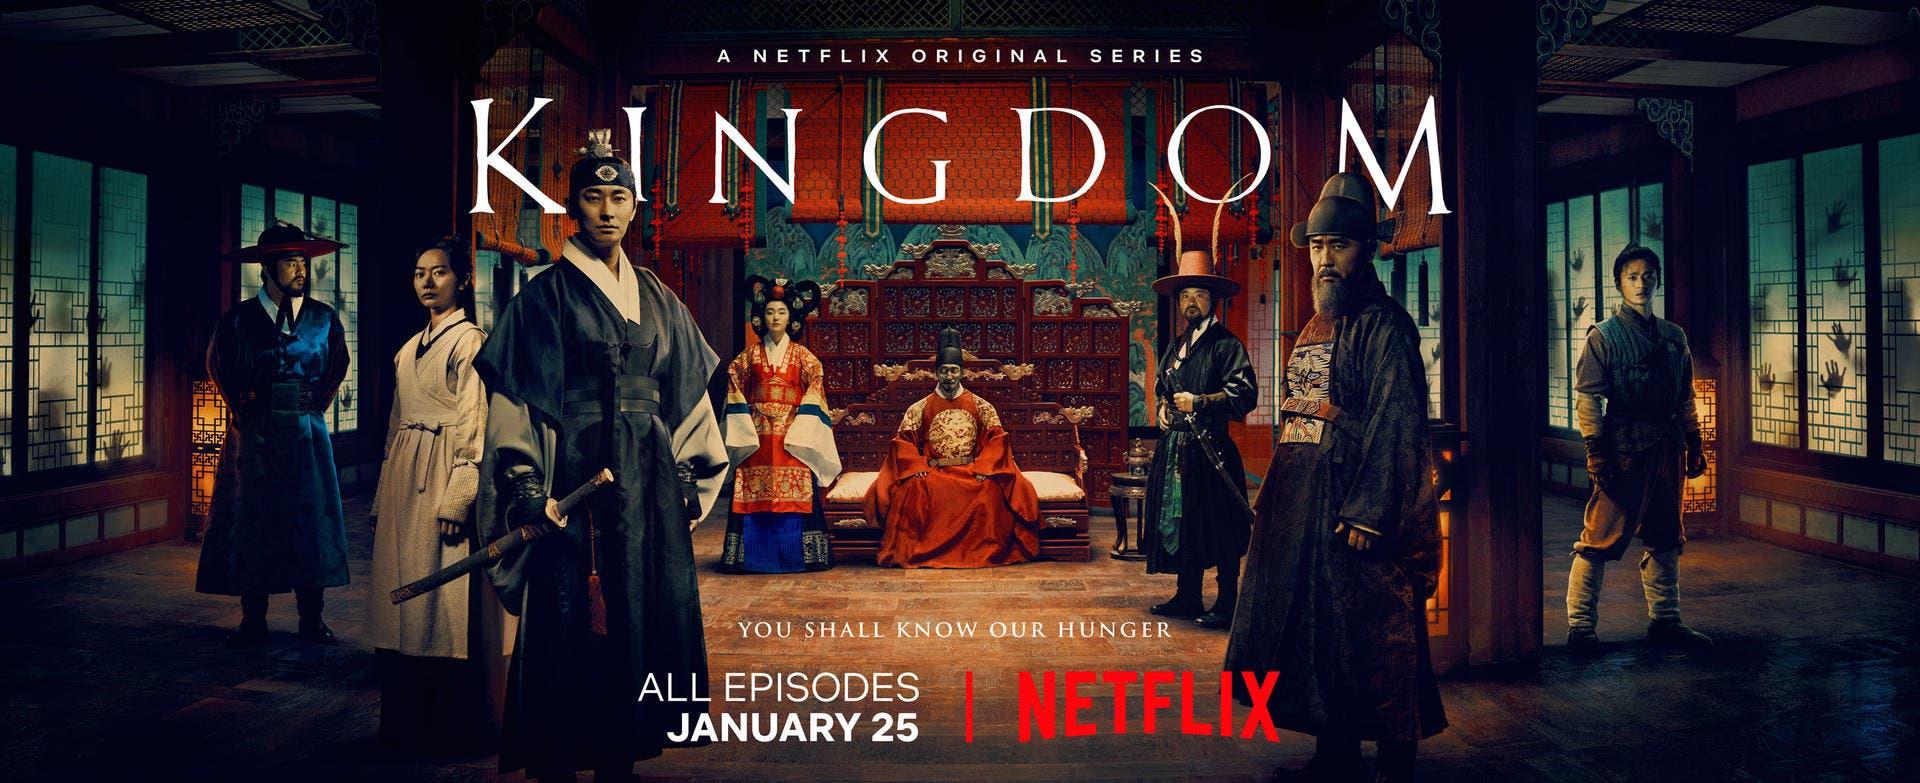 kingdom serie netflix